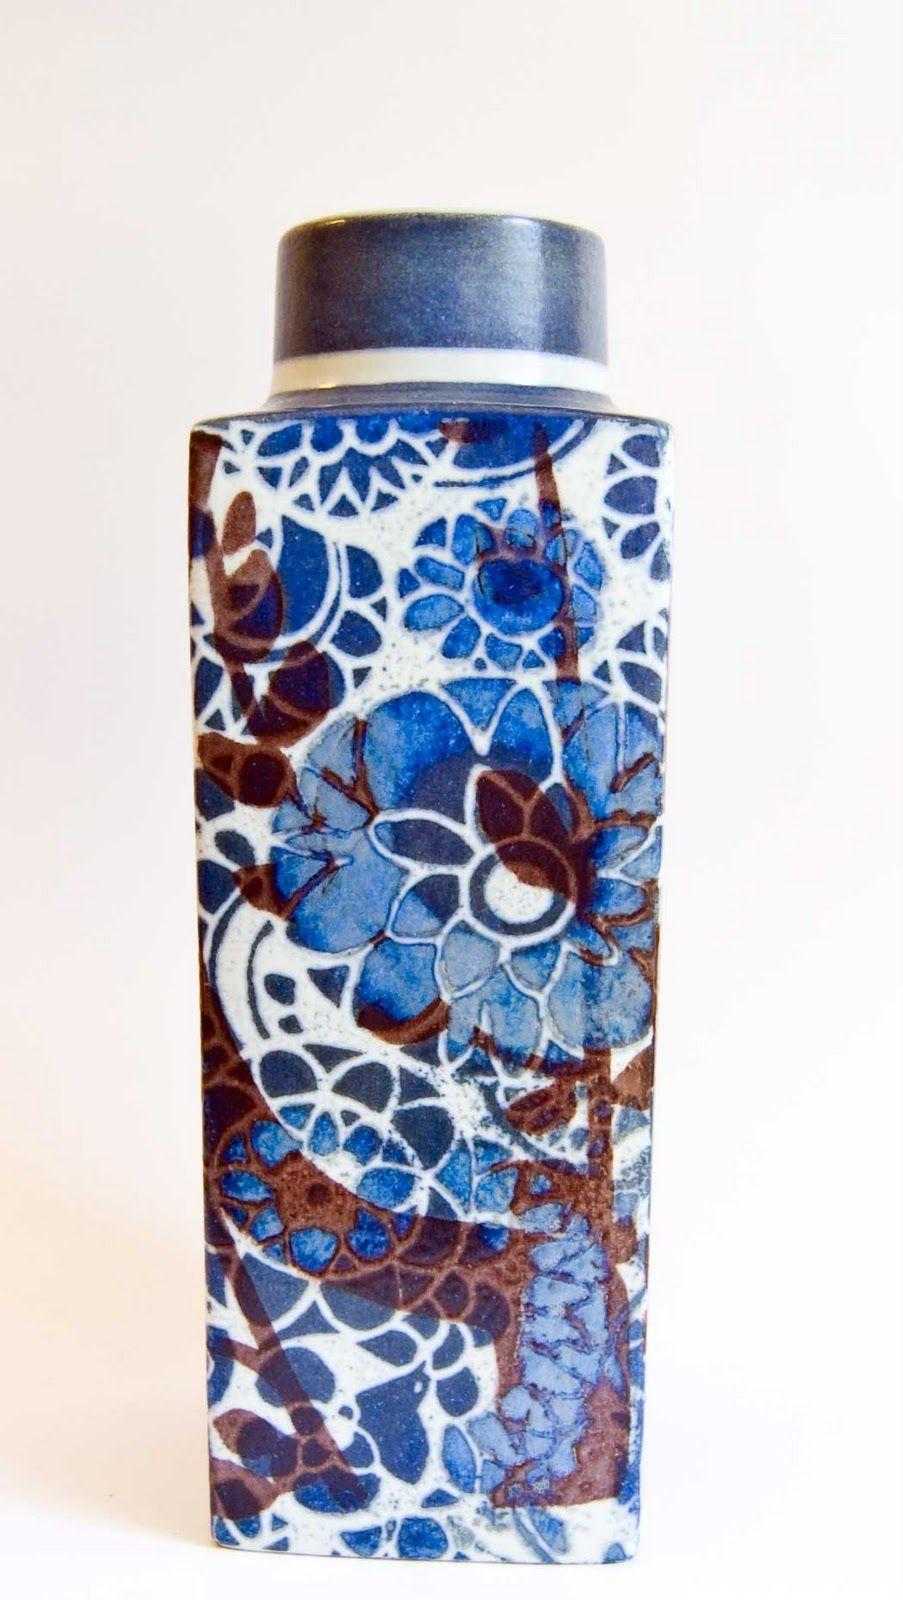 Retro pottery net royal copenhagen fajance vase johanne gerber retro pottery net royal copenhagen fajance vase johanne gerber reviewsmspy